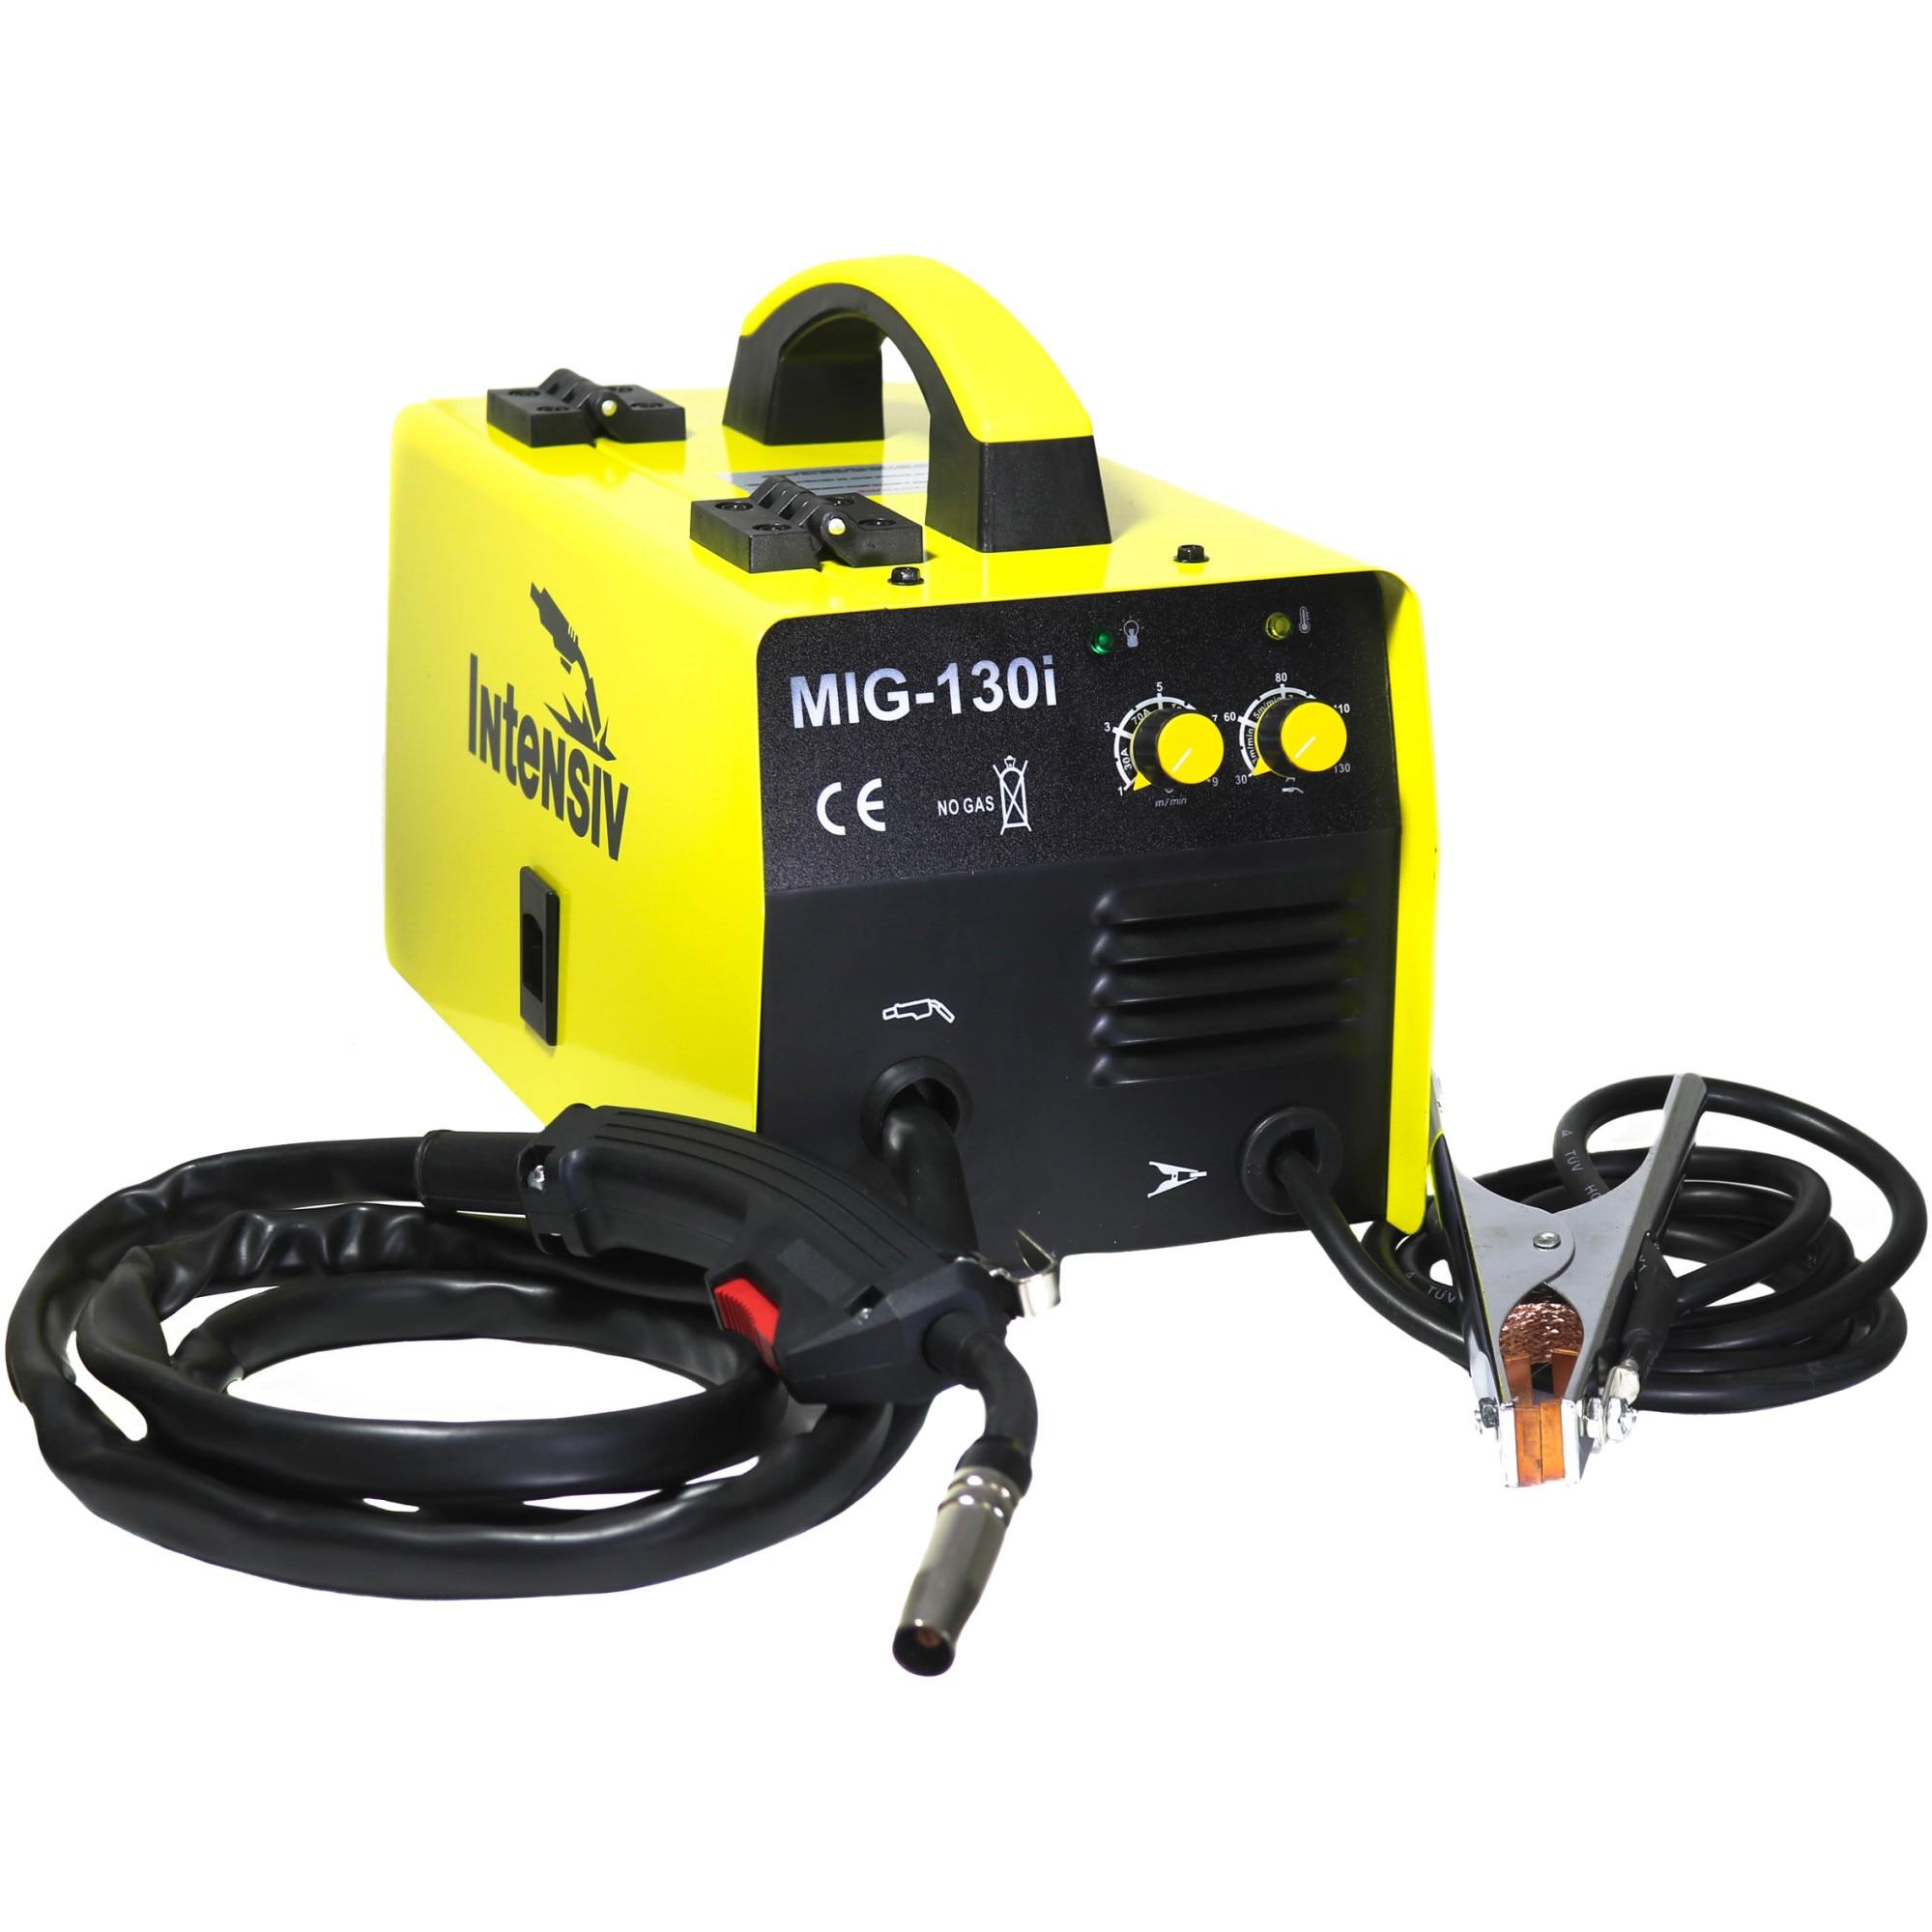 Fotografie Aparat sudura MIG MAG tip invertor, cu sarma cu flux, Intensiv MIG 130i, curent de sudare 30-120A, 230 V, rola maxim 1 kg, accesorii sudura